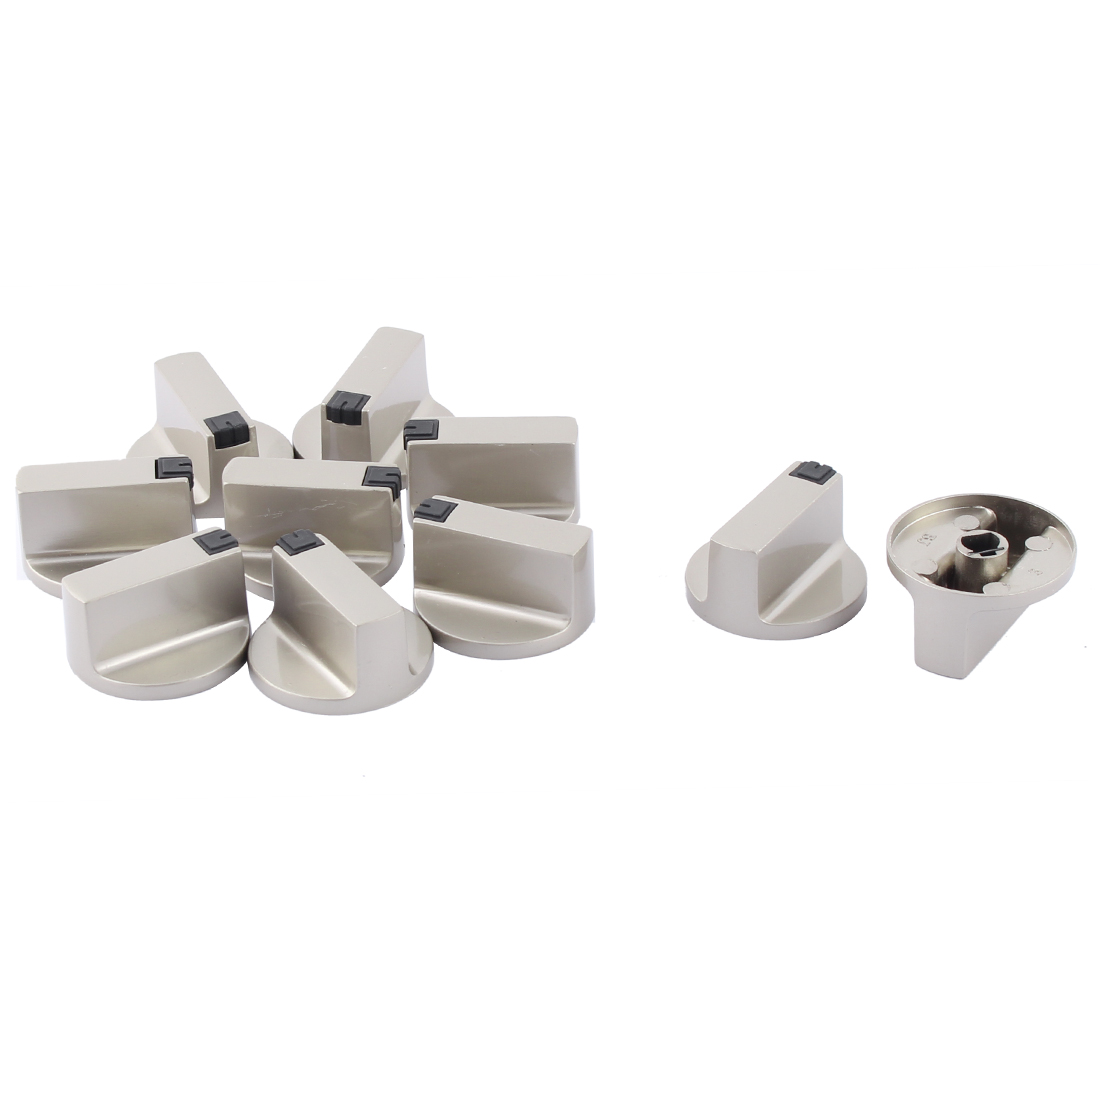 Kitchen Gas Stove Oven Alloy Bevel Hole Design Rotary Switch Range Knob 4cm Dia 10pcs